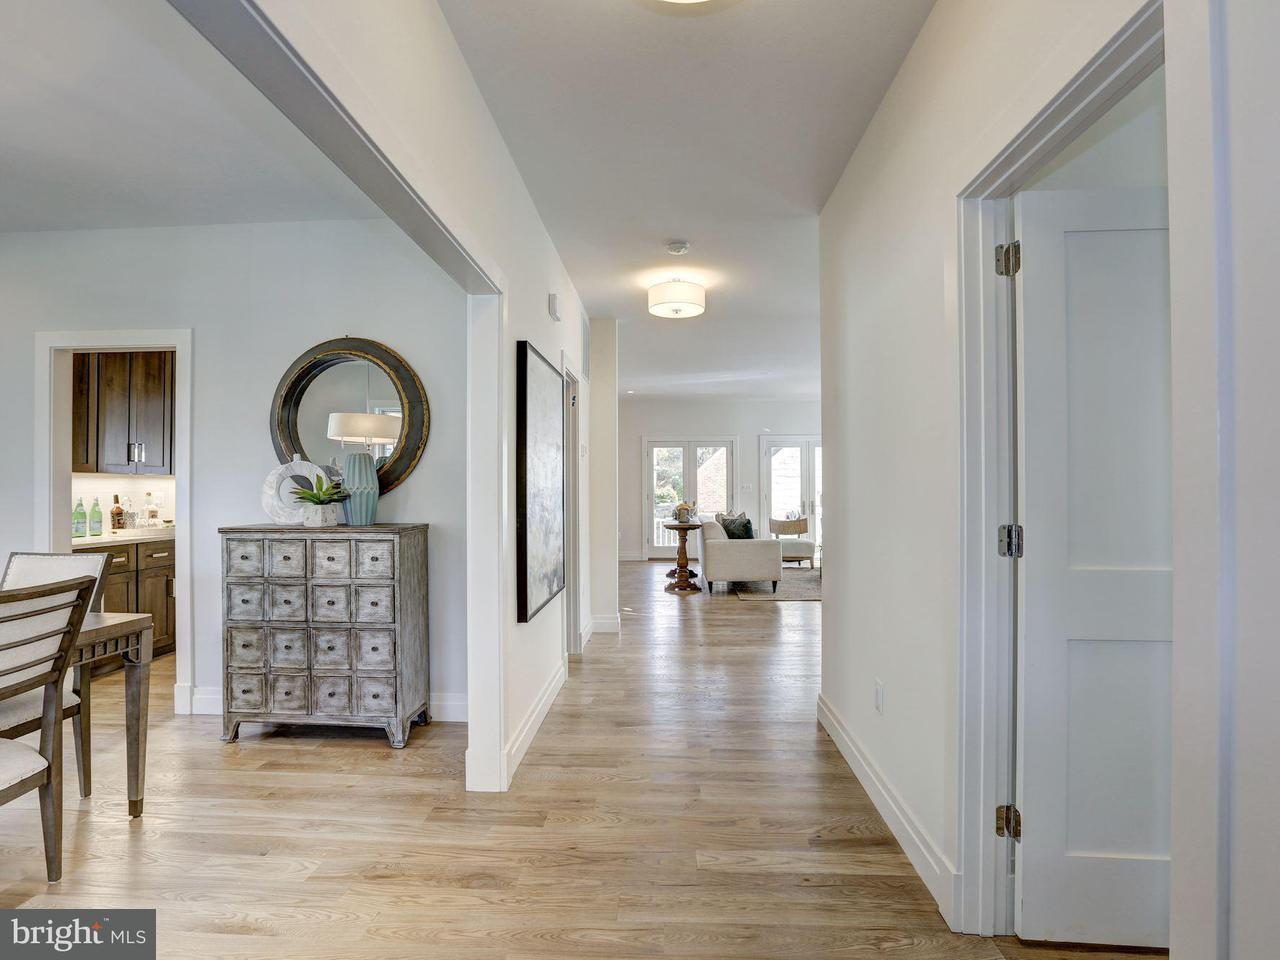 Single Family Home for Sale at 929 DANIEL ST N 929 DANIEL ST N Arlington, Virginia 22201 United States